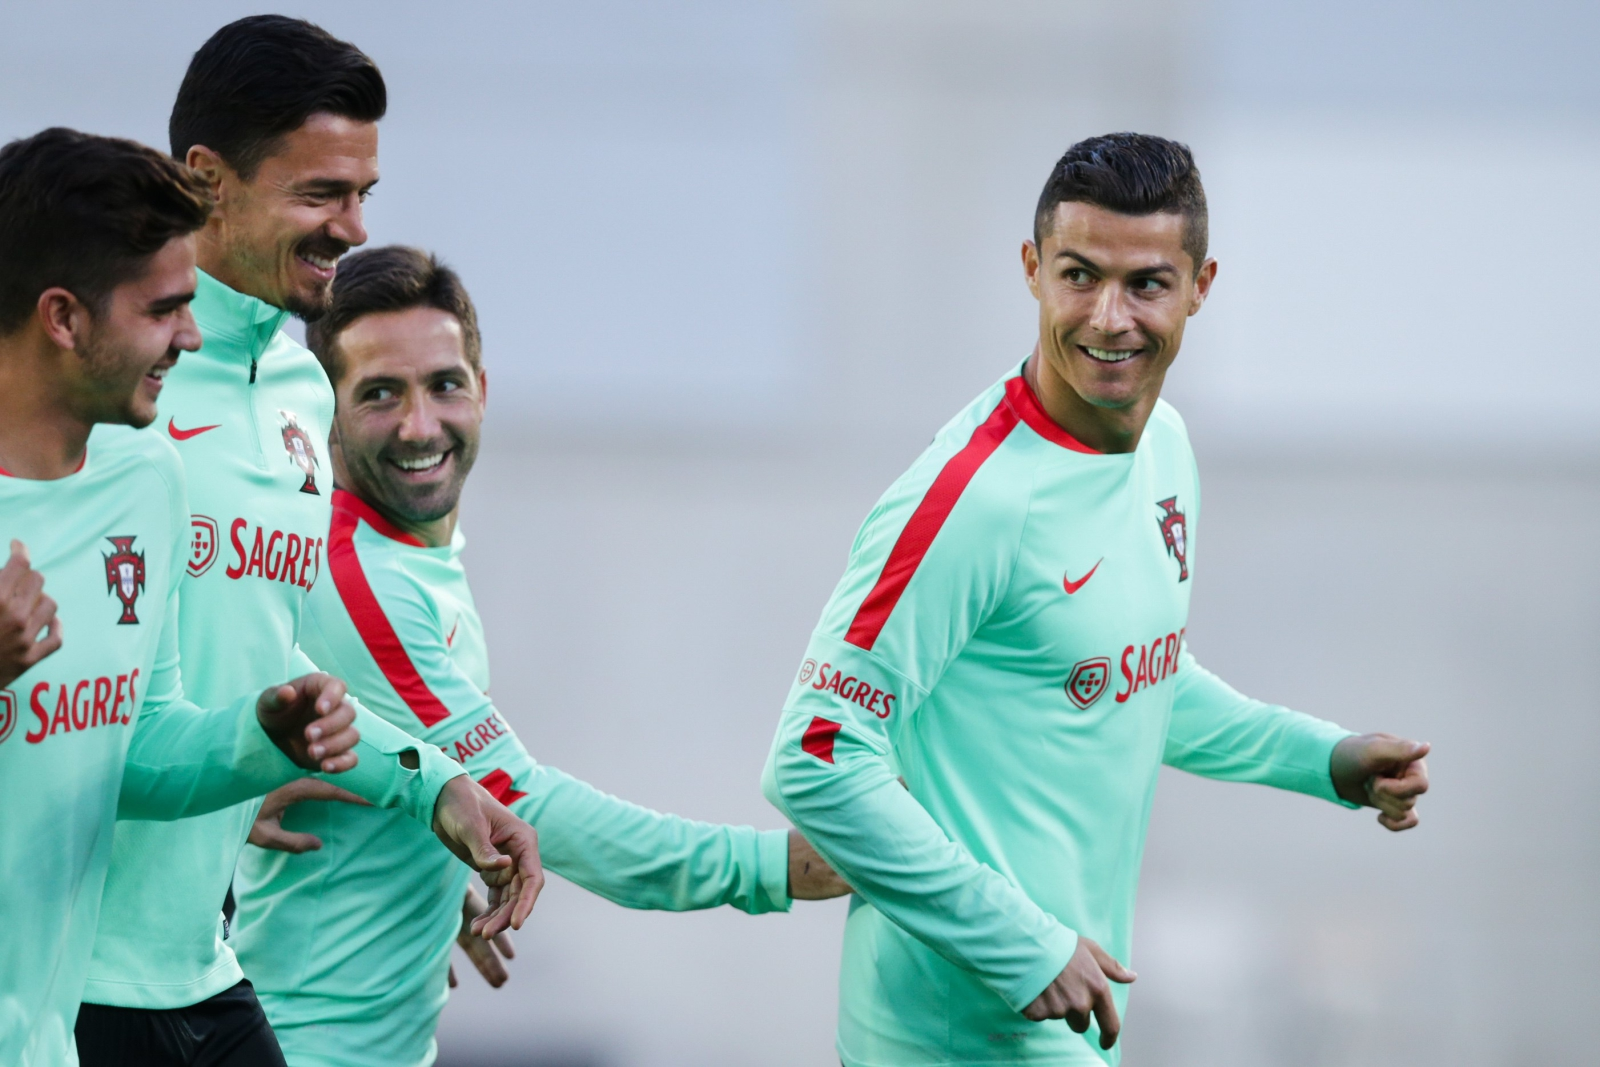 Trening reprezentacji Portugalii. fot. EPA/JOSE COELHO